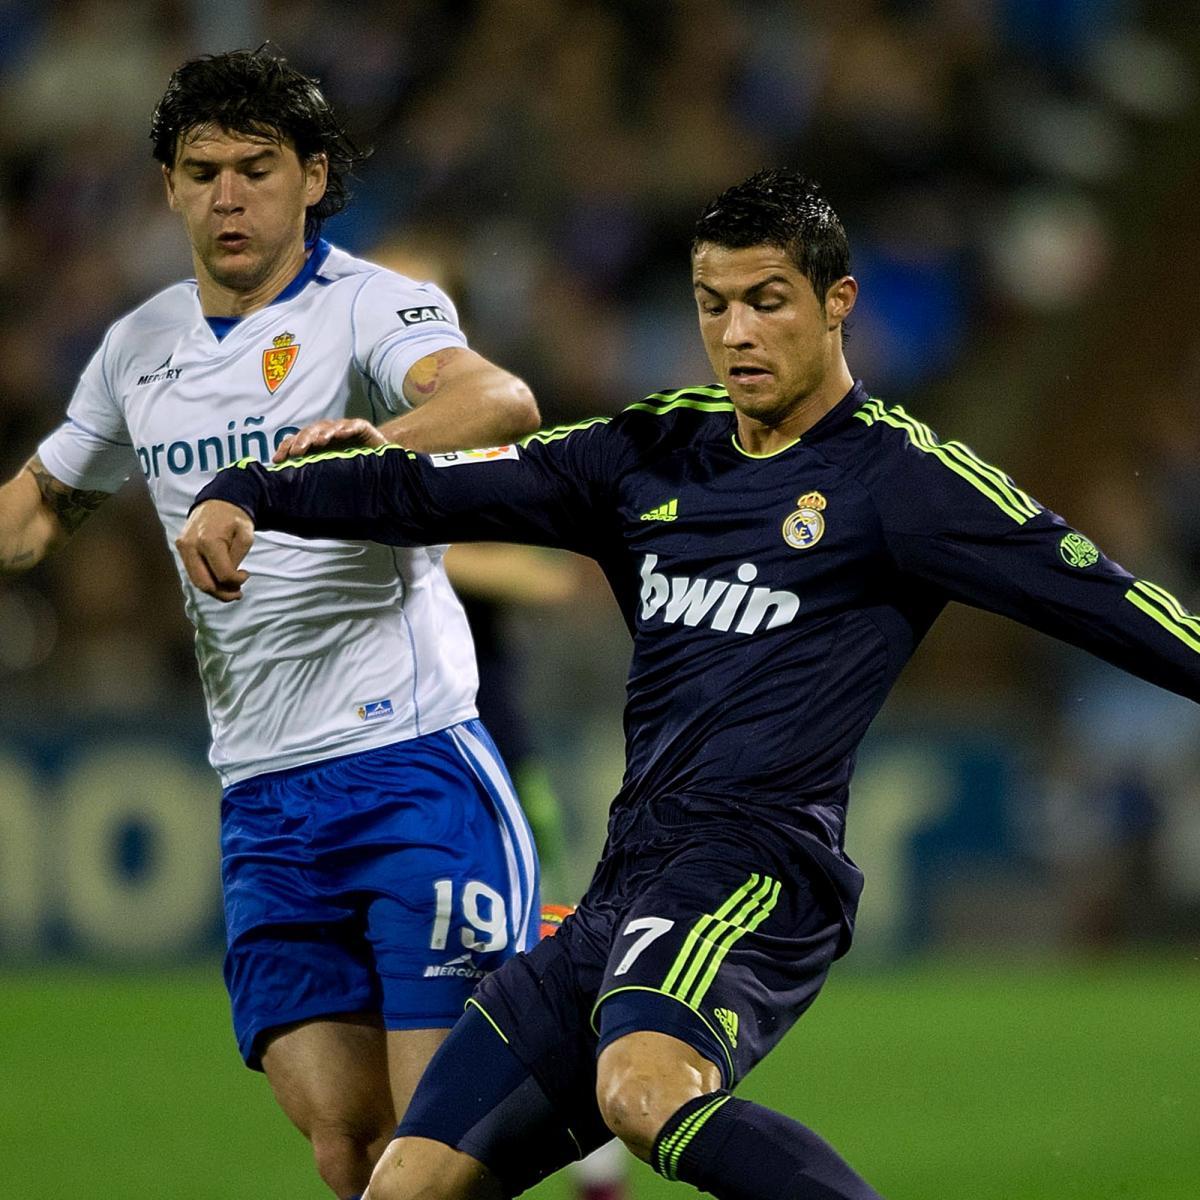 Celta Vigo Vs Barcelona Live Commentary: Real Madrid Vs. Real Zaragoza: Score, Grades And Post